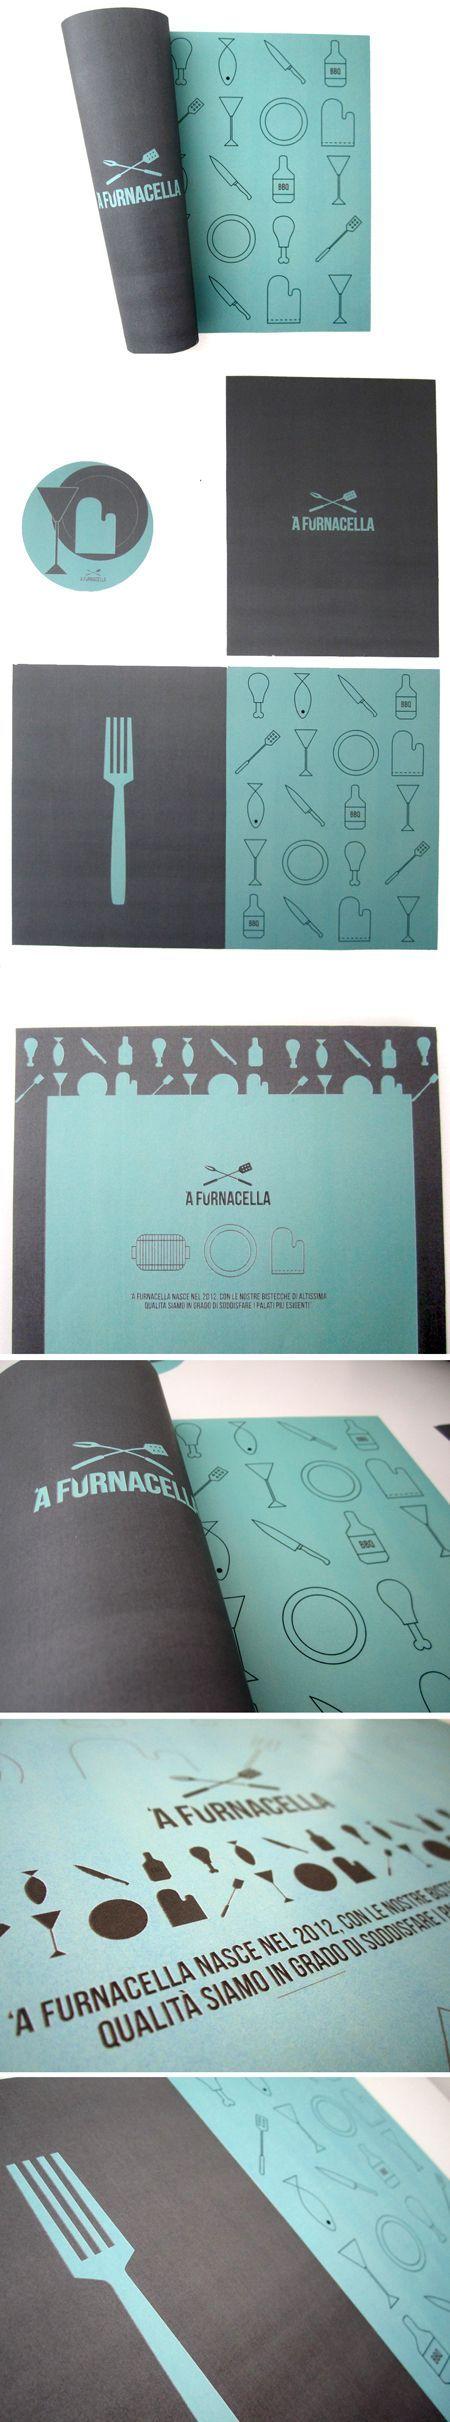 A' Furnacella #branding #logo #design